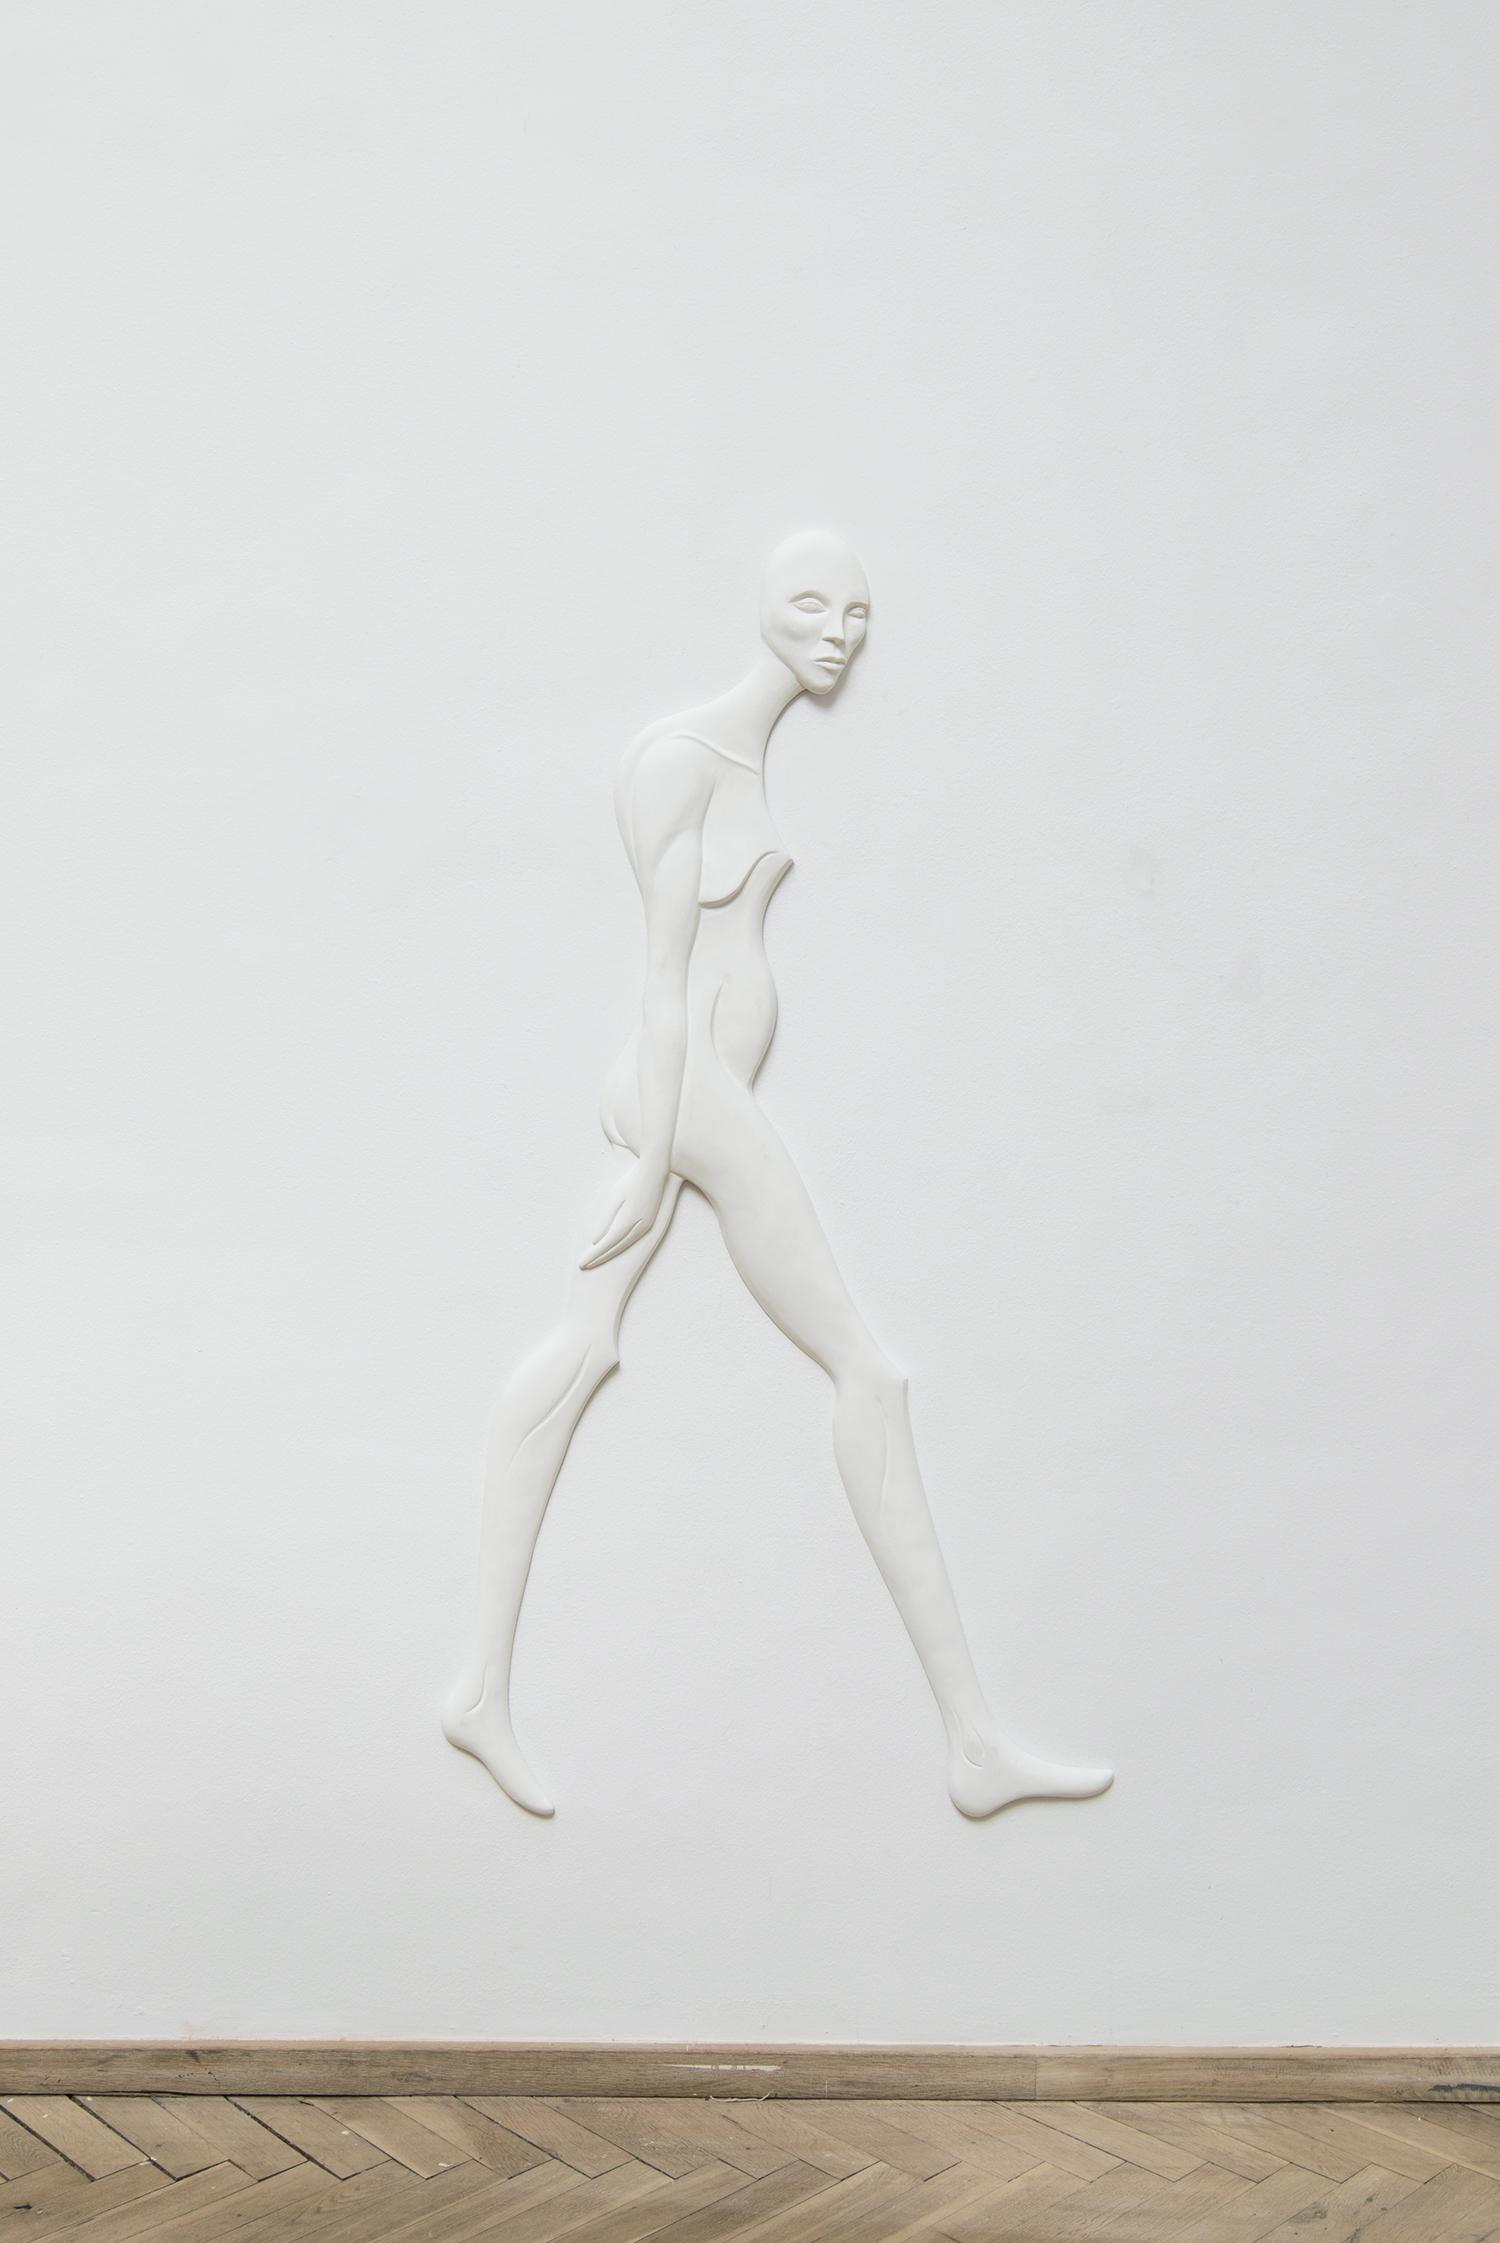 Aia Sofia Coverley Turan, Teeters. (Detalje). Foto © I DO ART Agency.